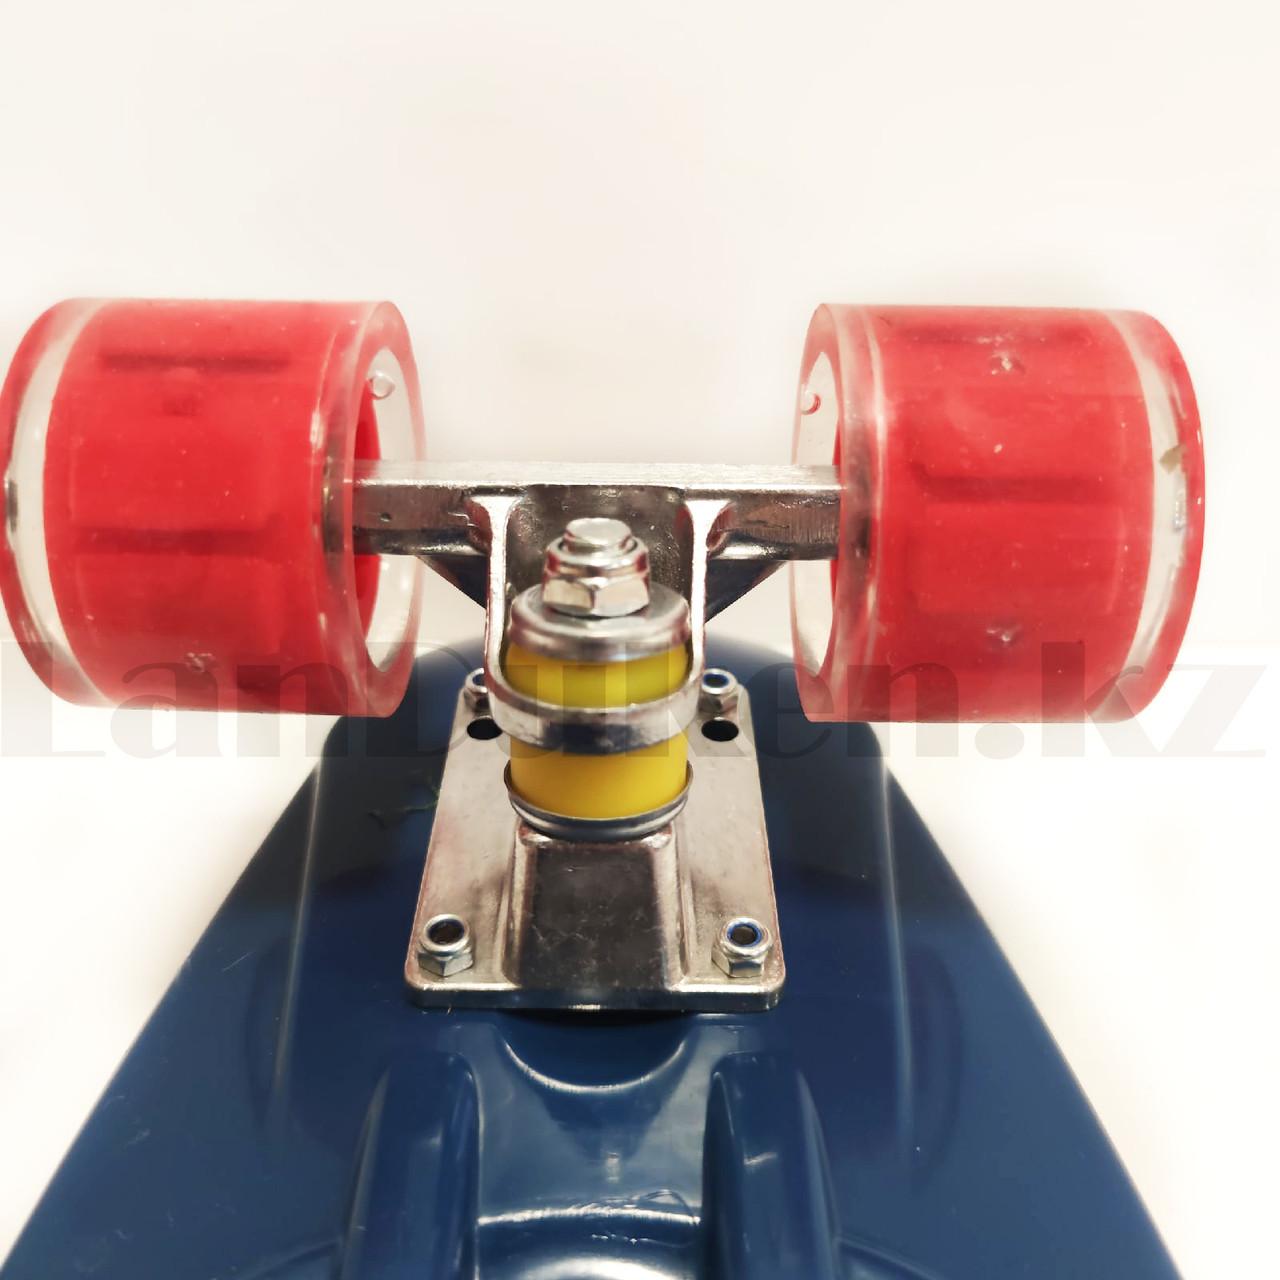 Лонгборд 59*16 Street Hit Волна с ручкой и со светящимися колесами (пенни борд) синий - фото 5